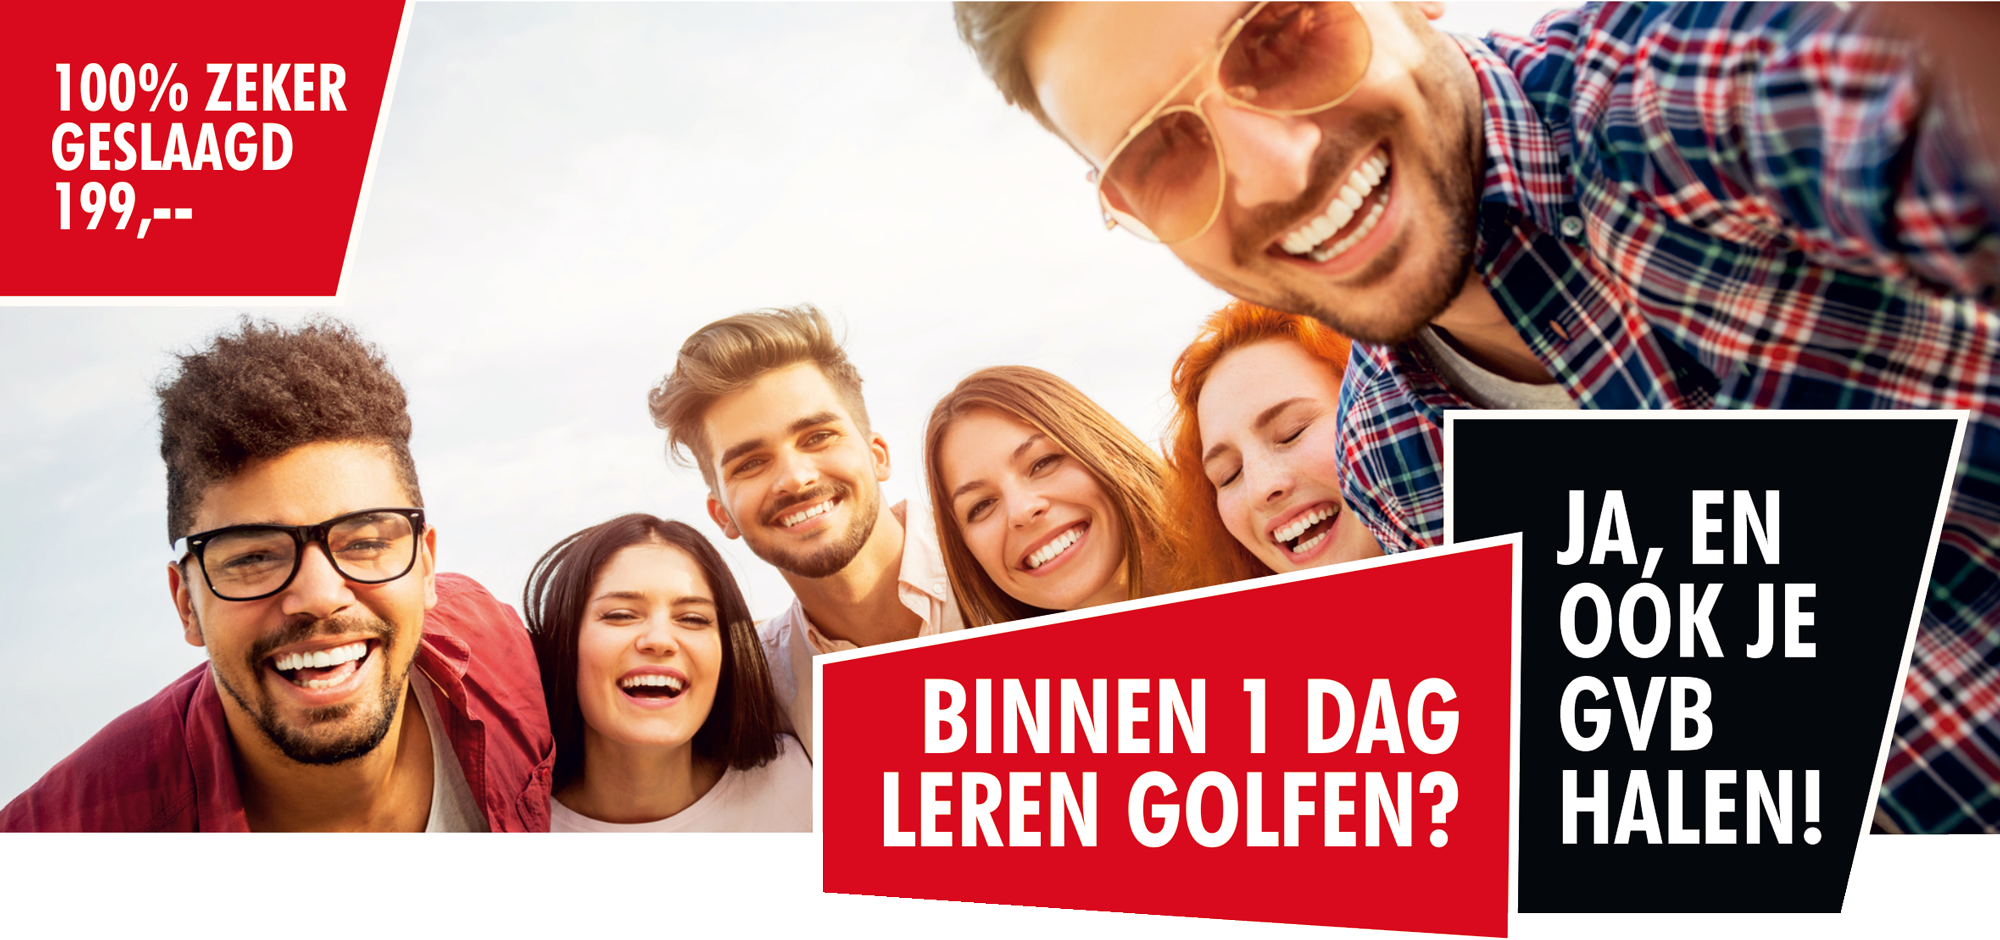 http://www.twentsegolfacademy.nl/gvb-halen/